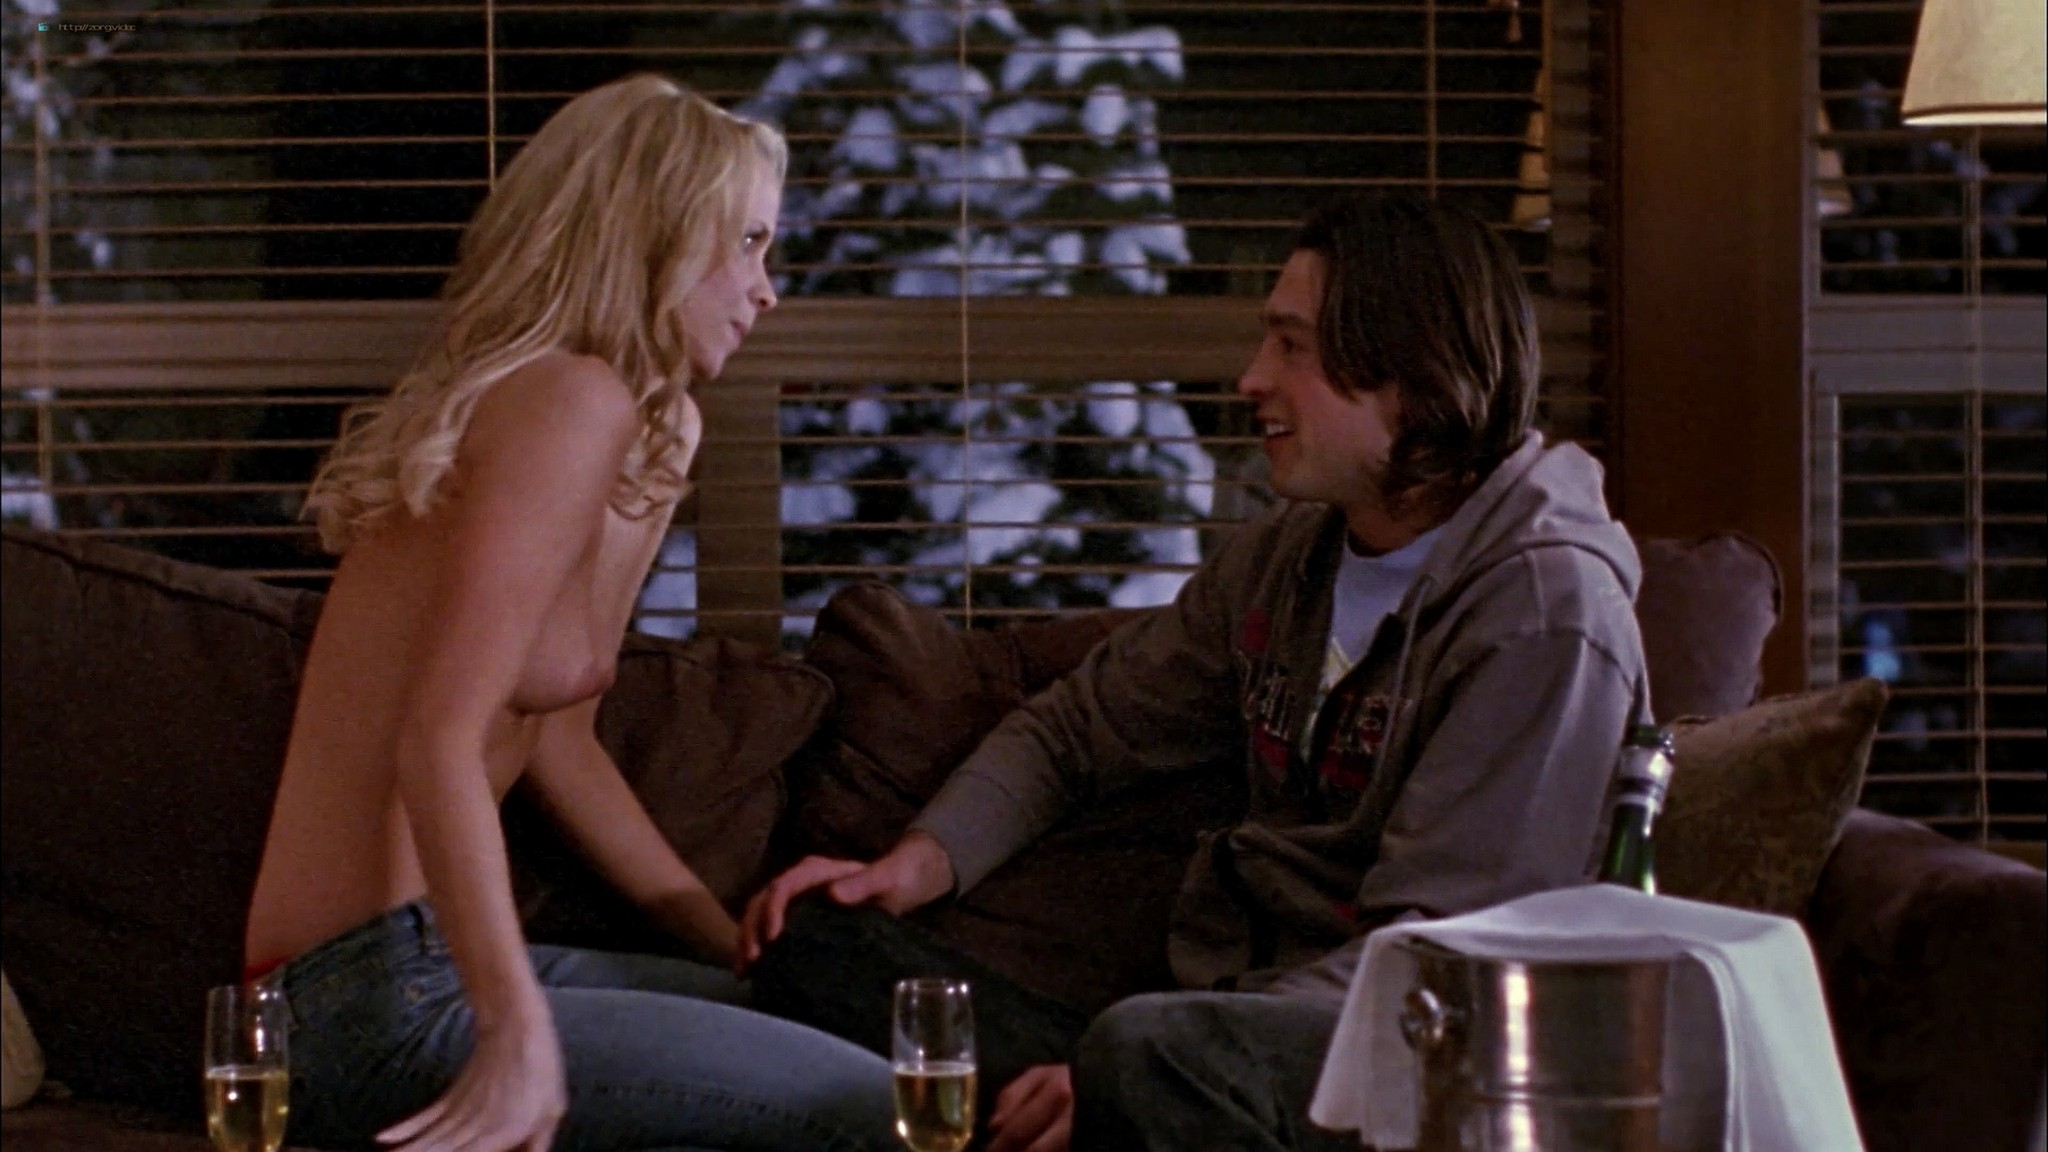 Lindsay Maxwell nude Amber Borycki sexy - Revenge of the Boarding School Dropouts (2009) HD 1080p Web (9)